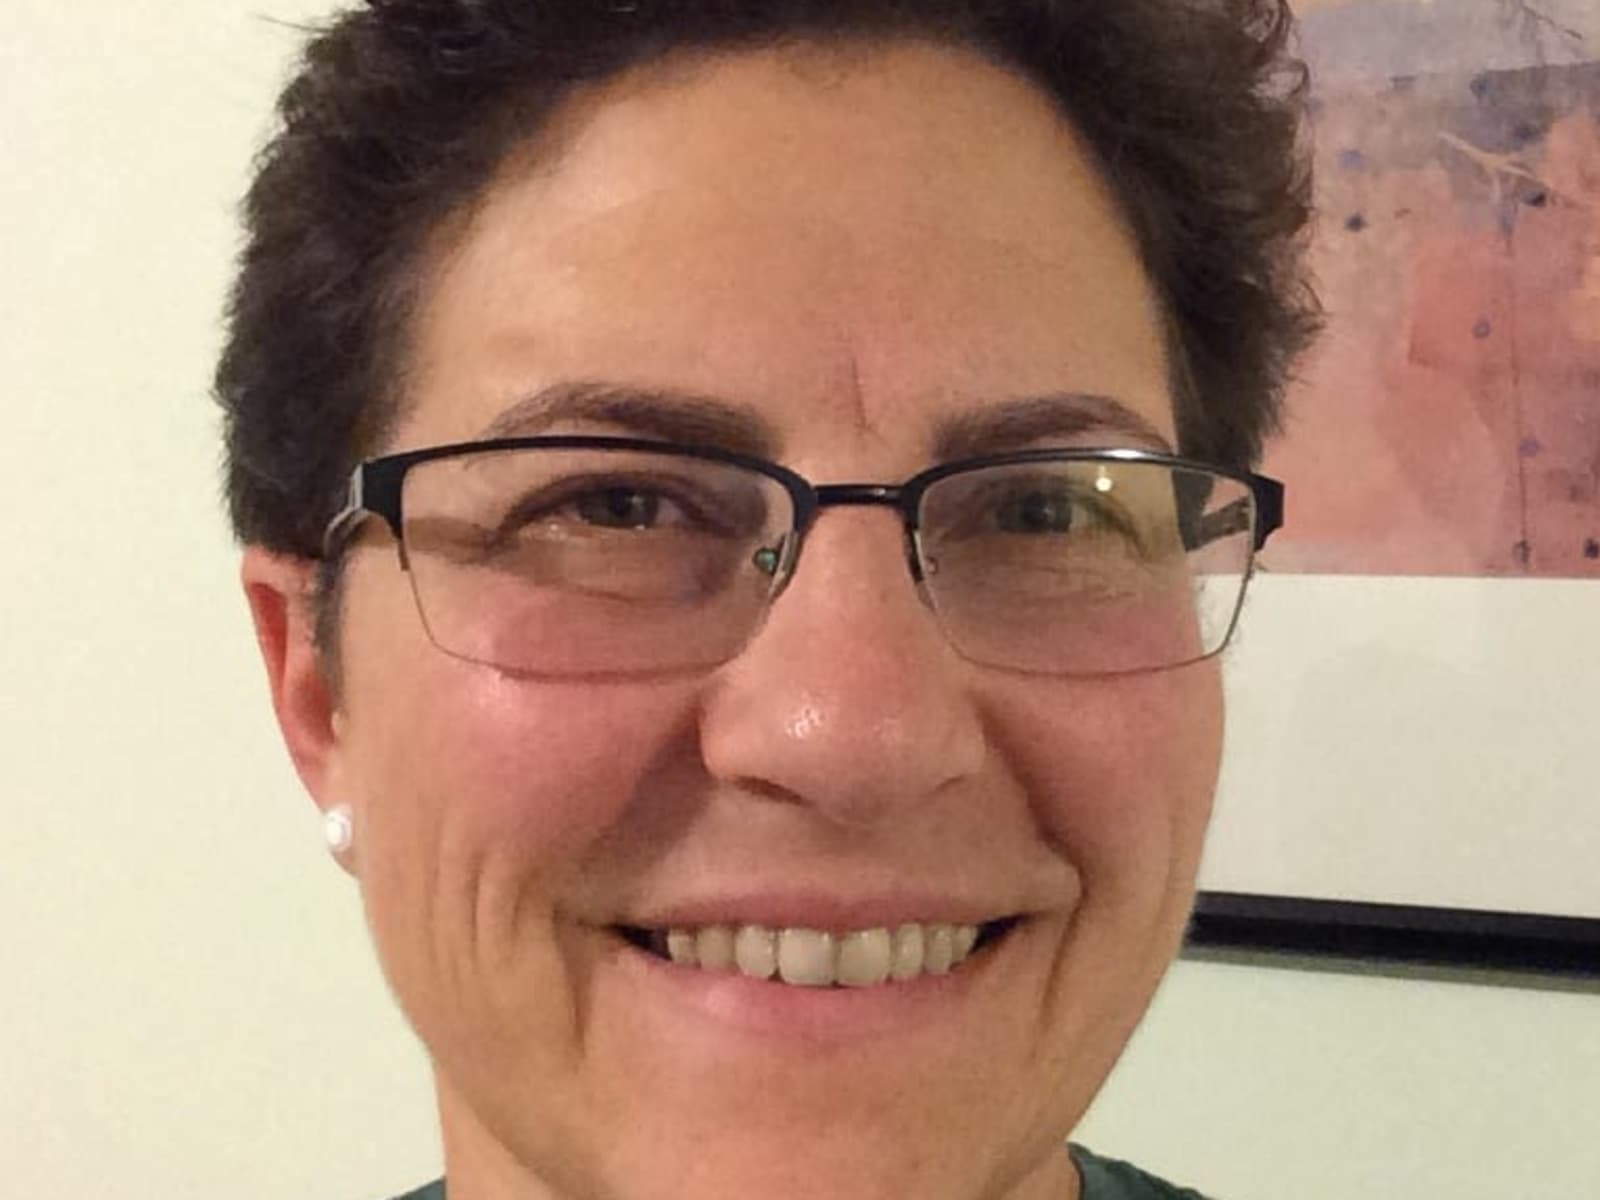 Judy from Greensboro, North Carolina, United States